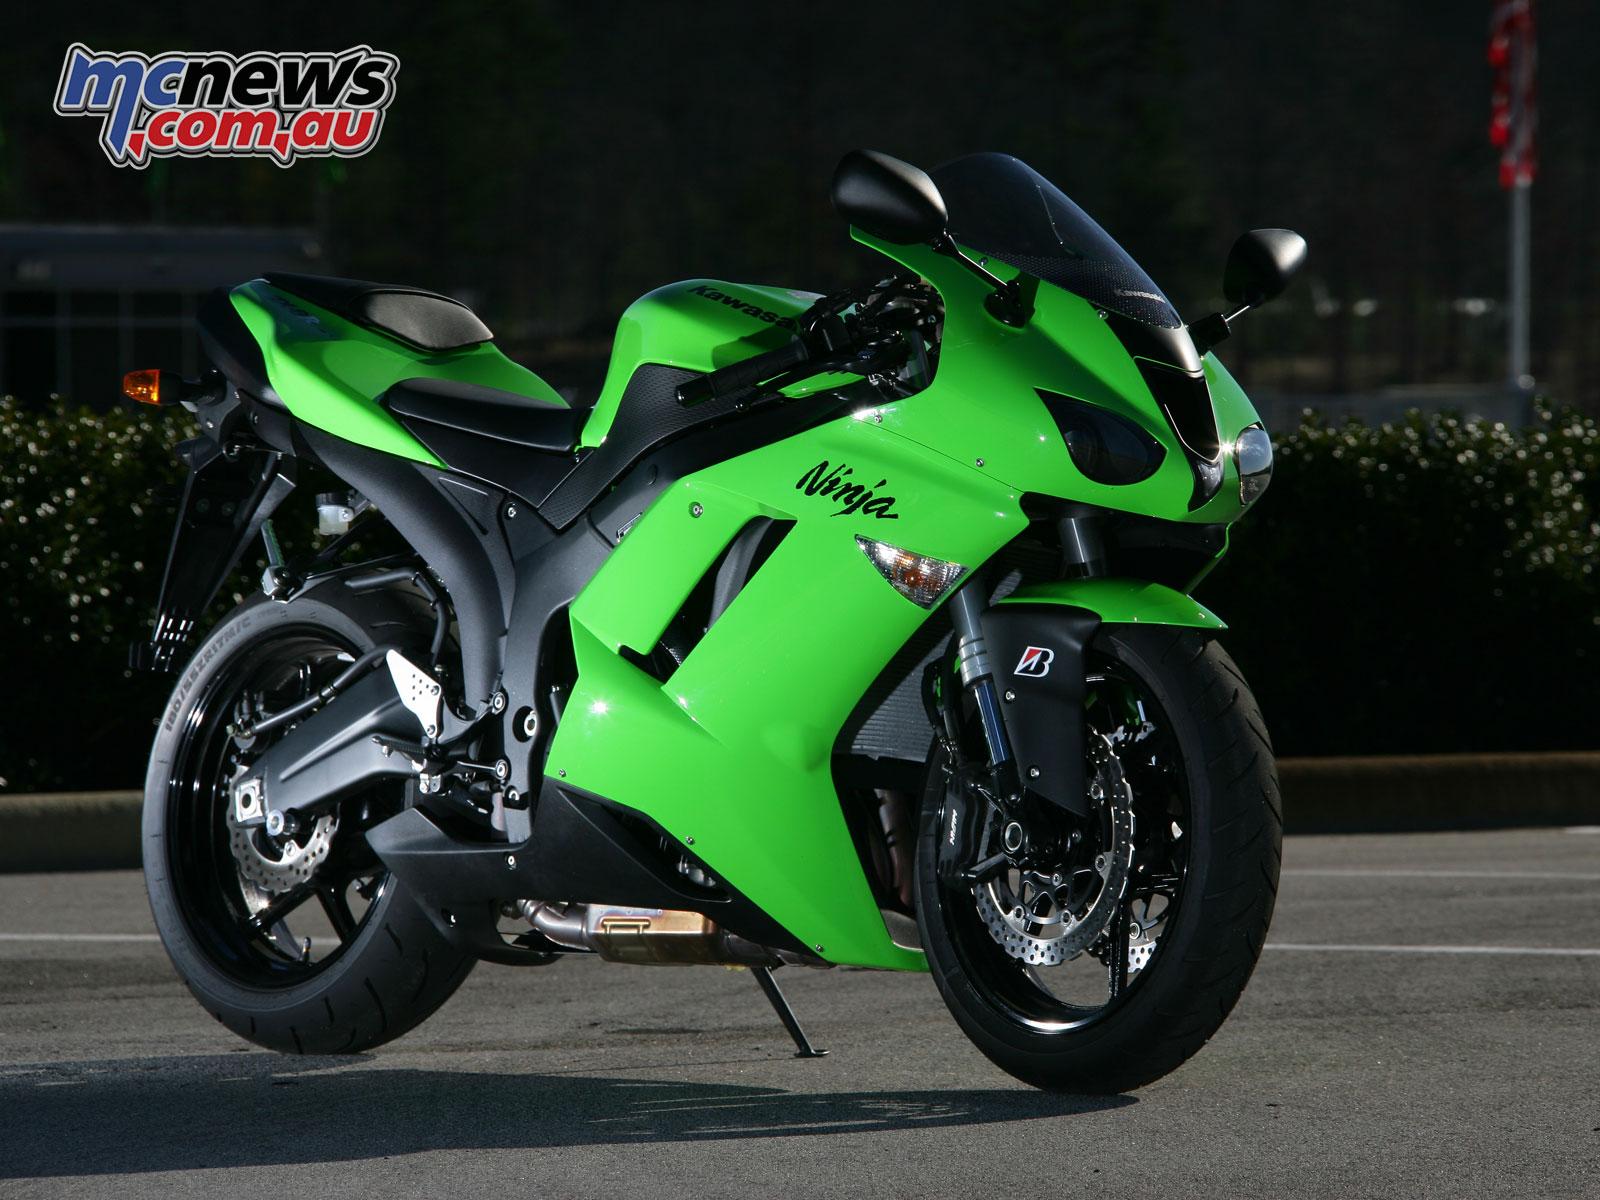 Kawasaki S 600 Supersports